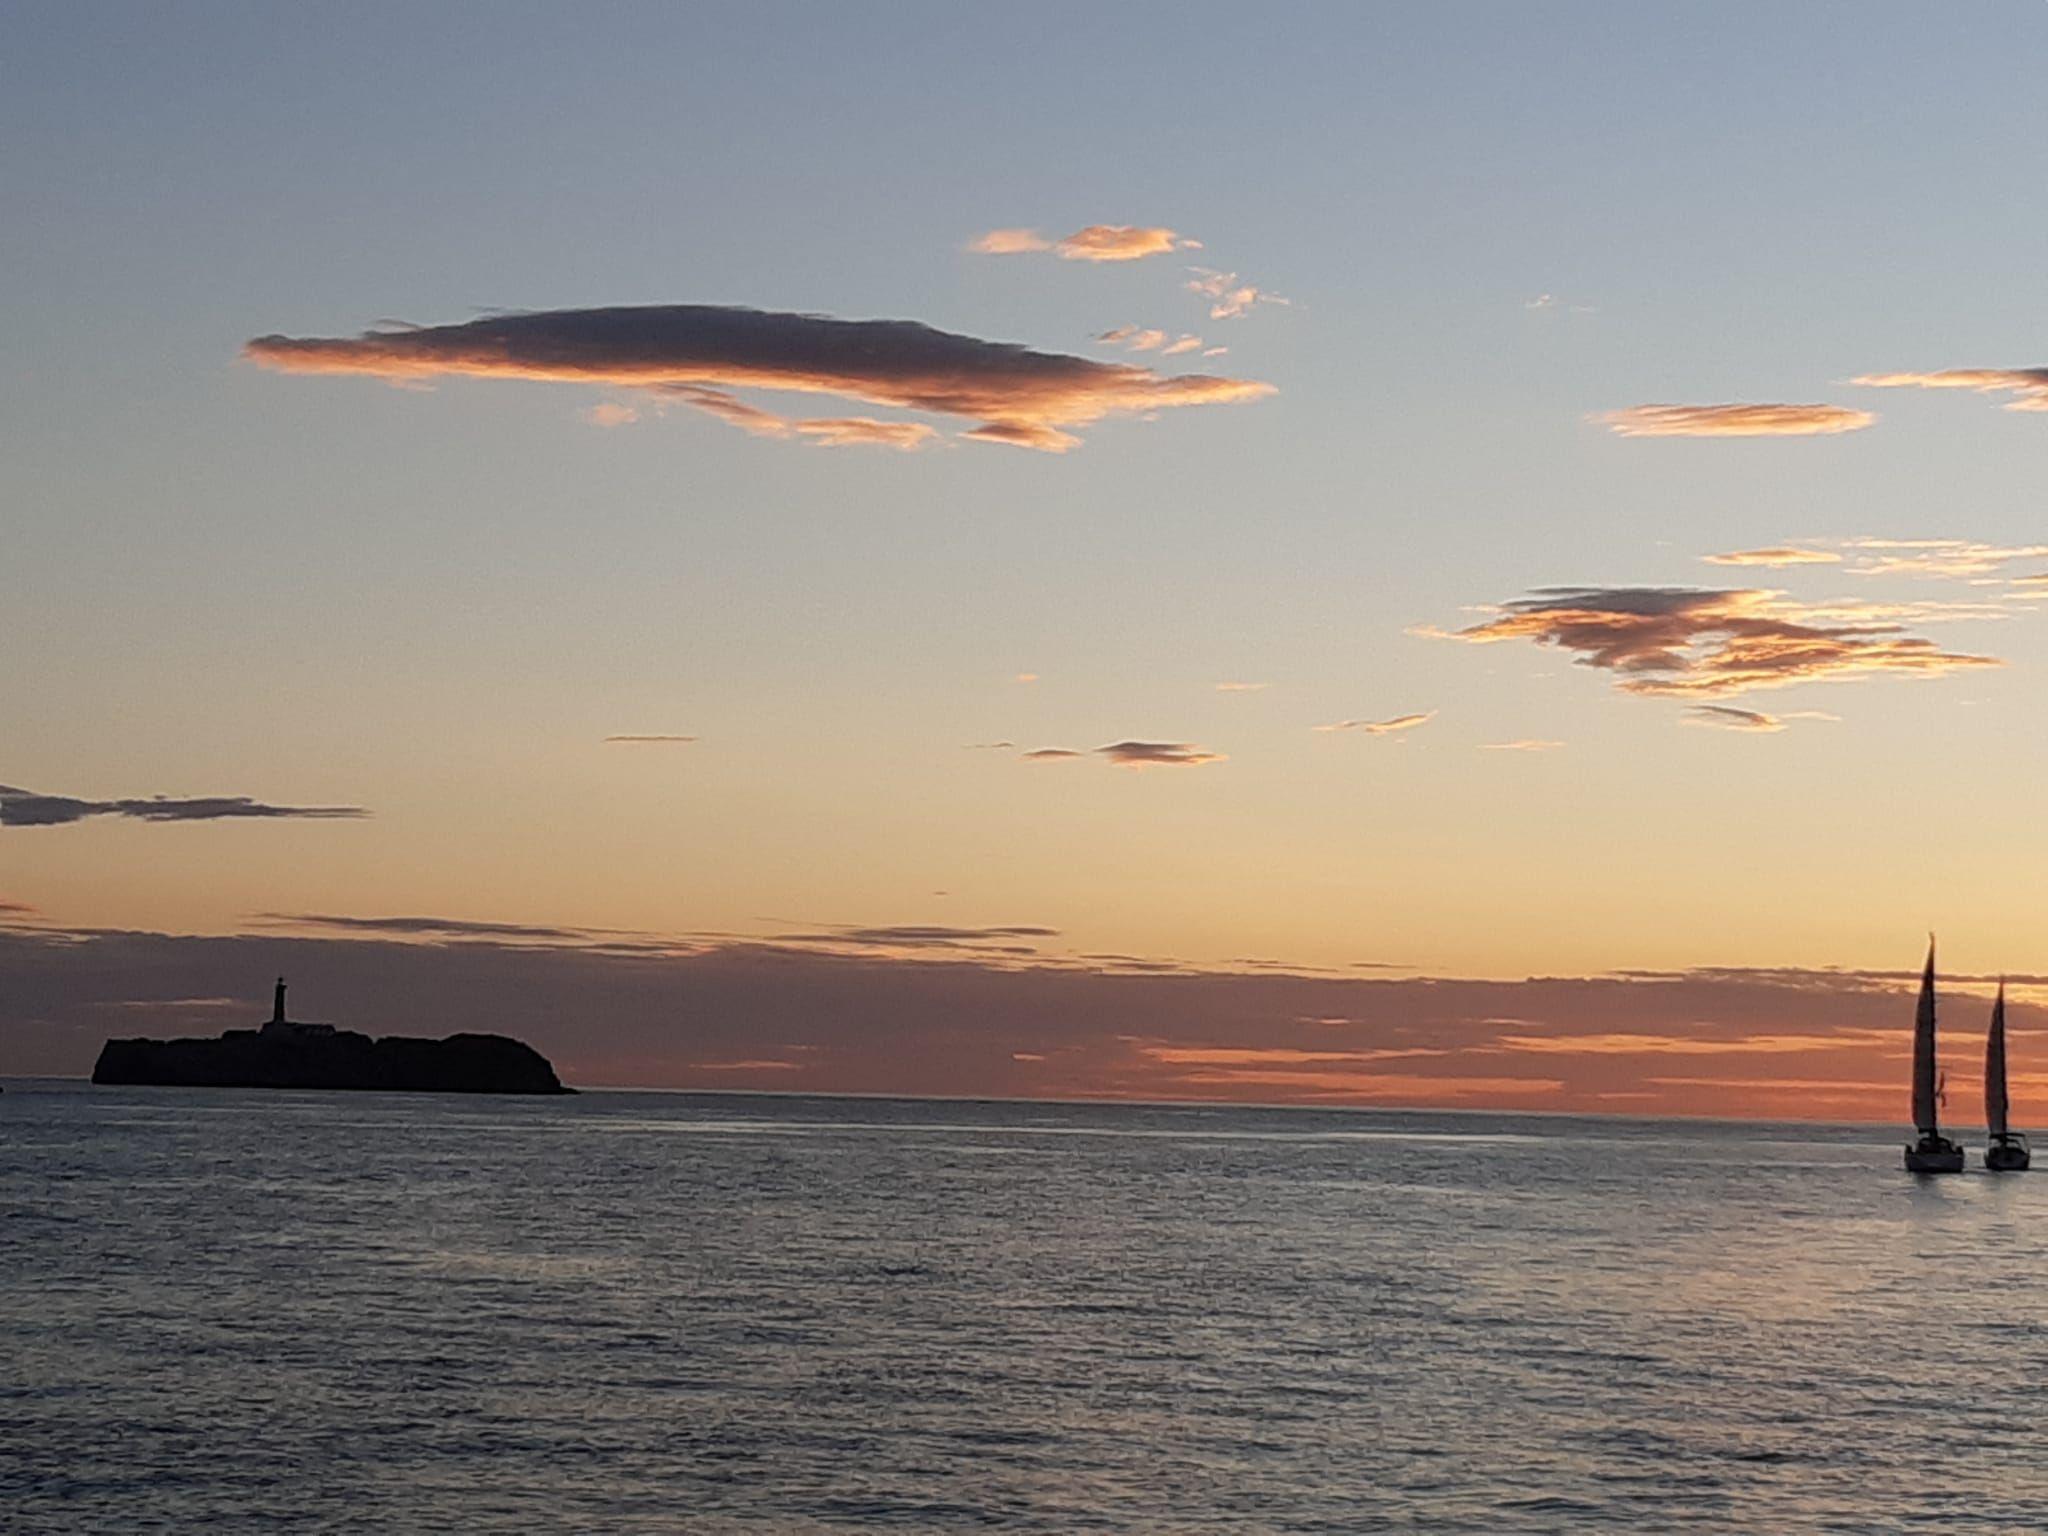 Sail the Way: Gijón espera la llegada de los peregrinos de la ruta jacobea por mar